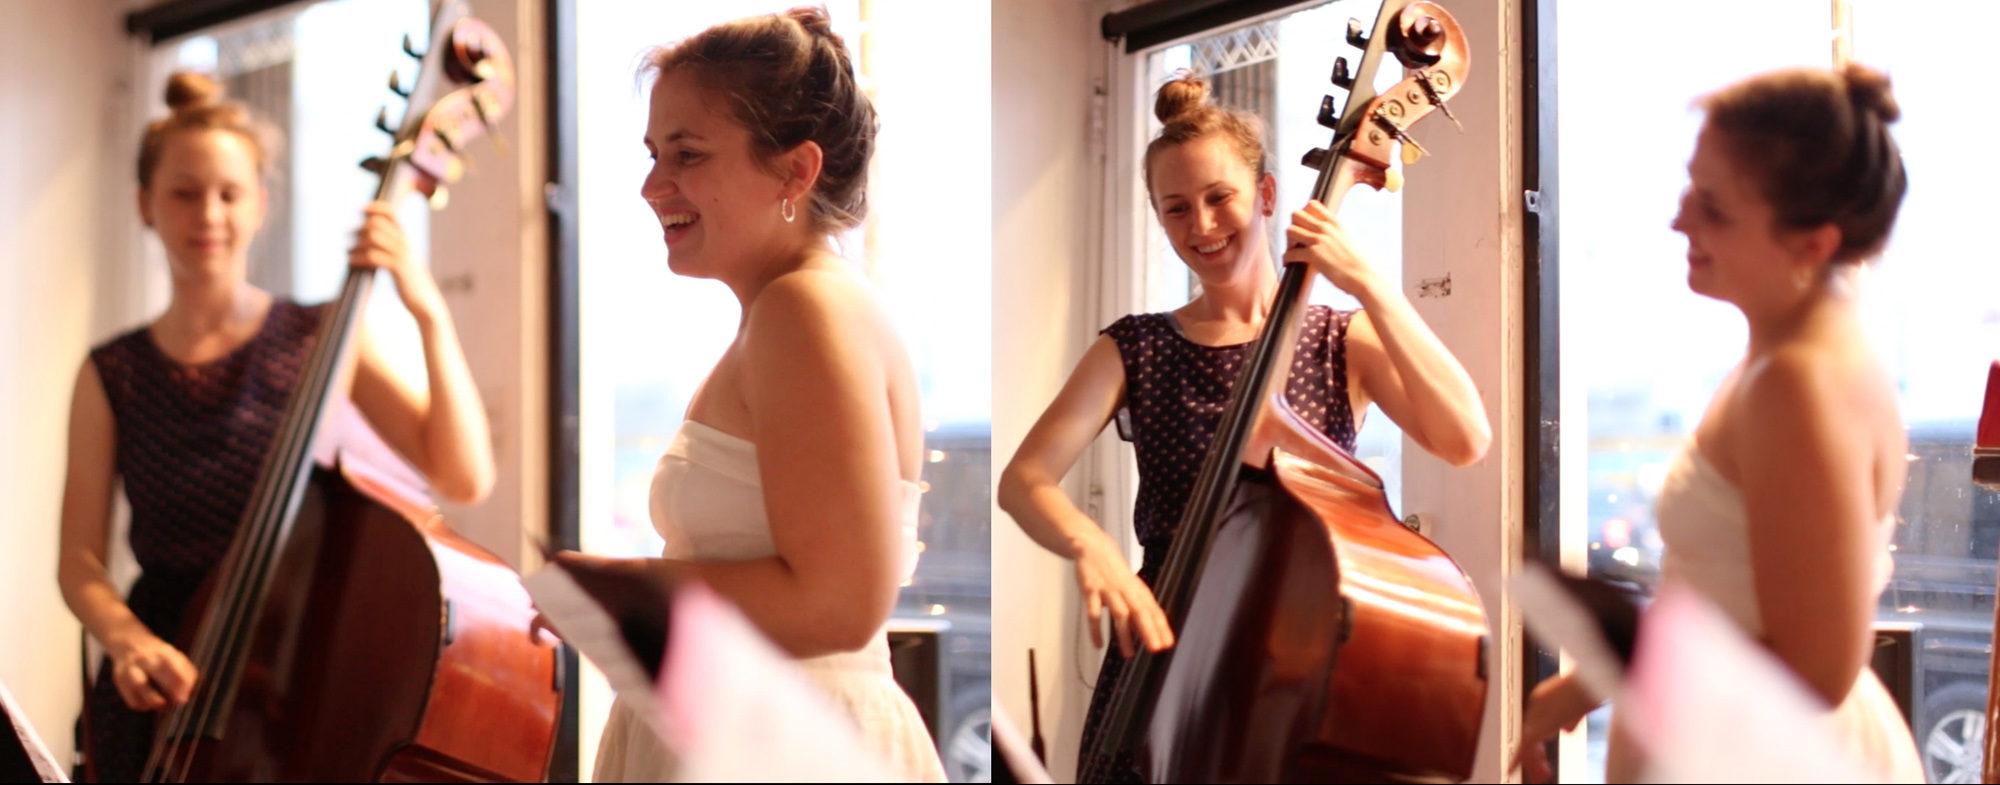 AMMAduo - Amy K Bormet and Maggie Hasspacher